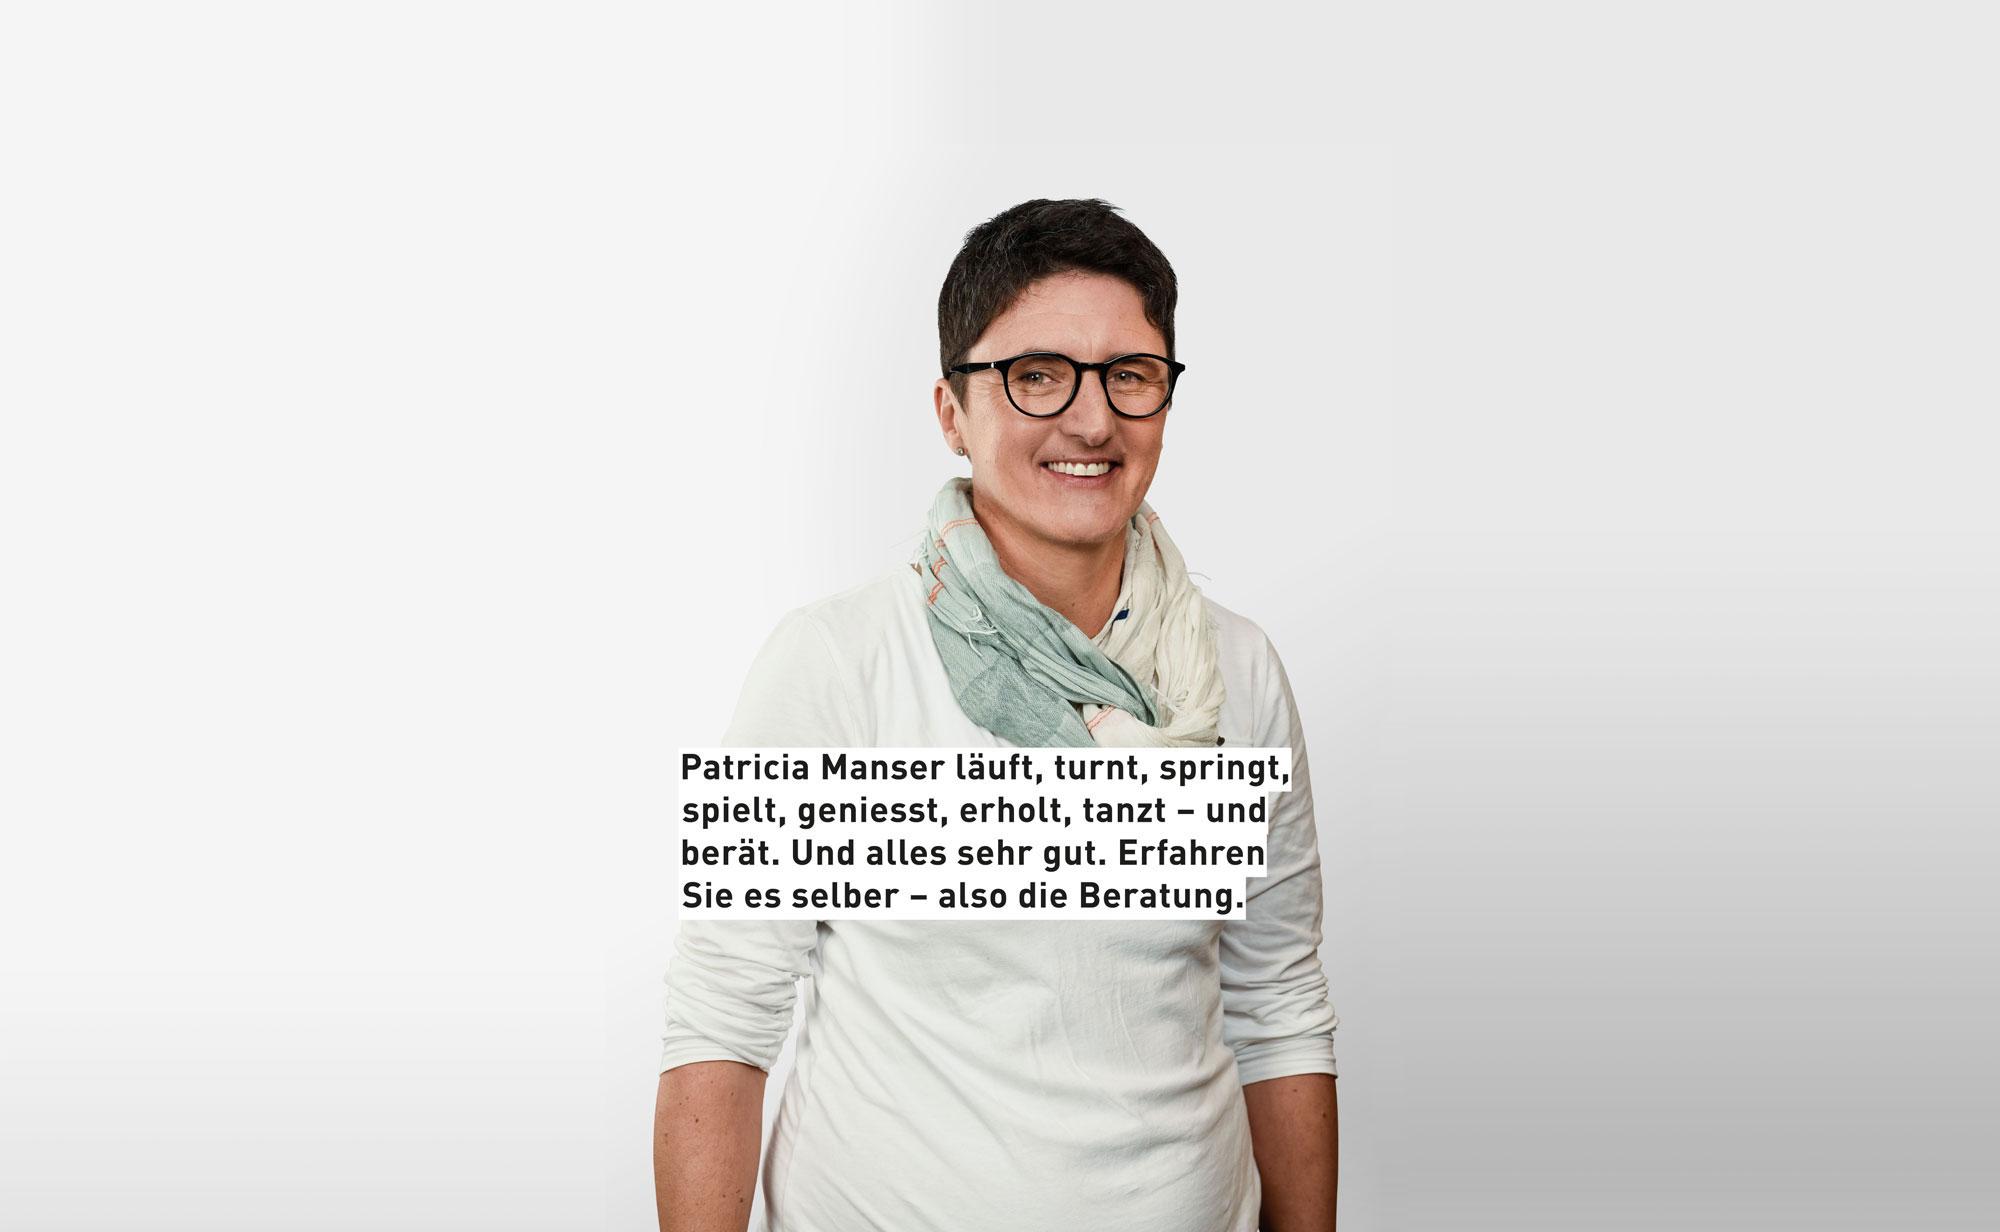 Patricia Manser